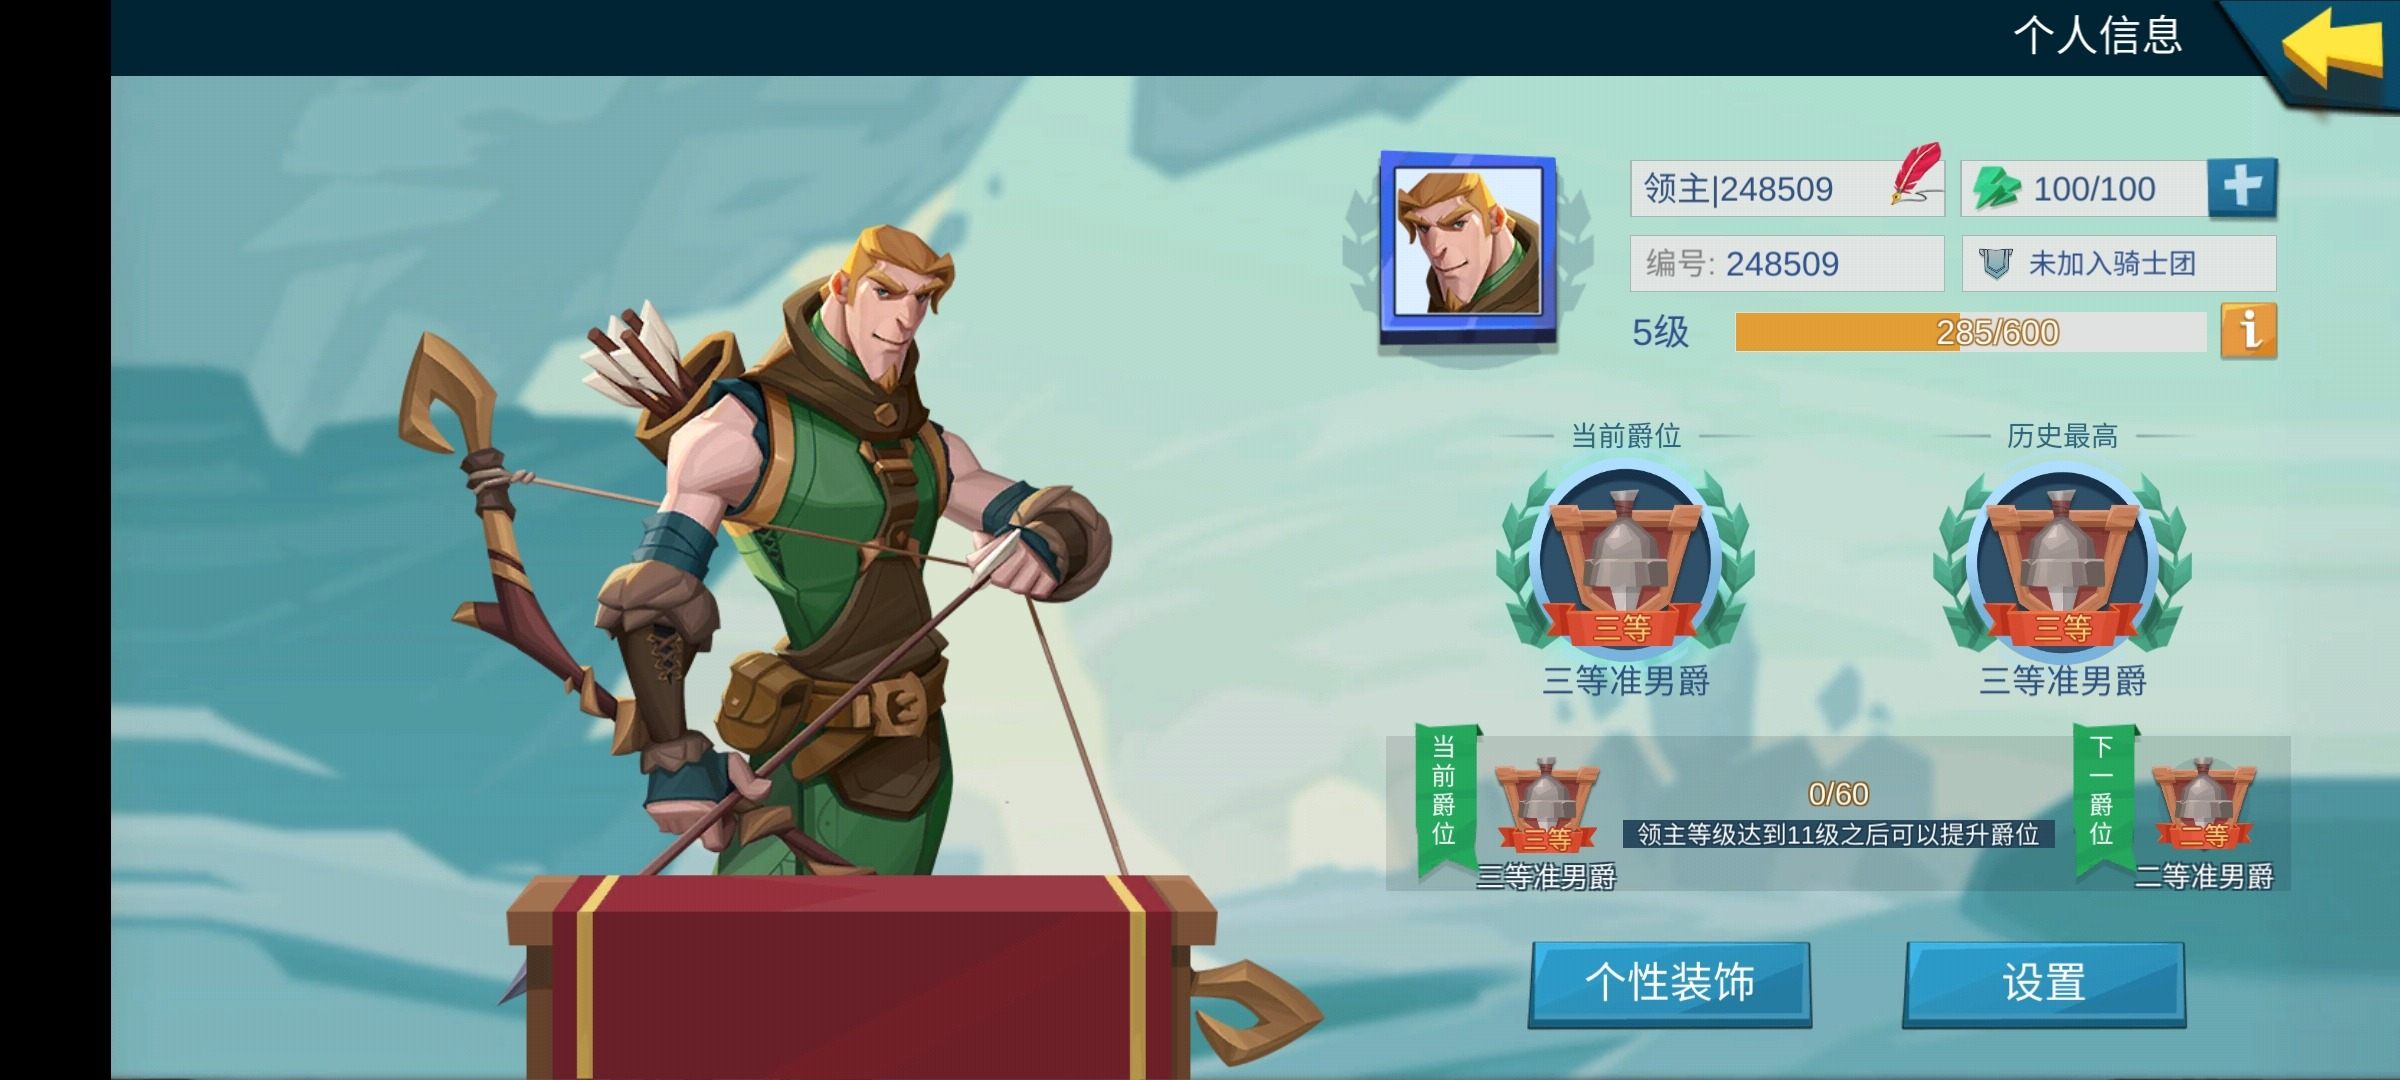 Screenshot_20210602_172035_com.jedigames.p21.guanwang.jpg